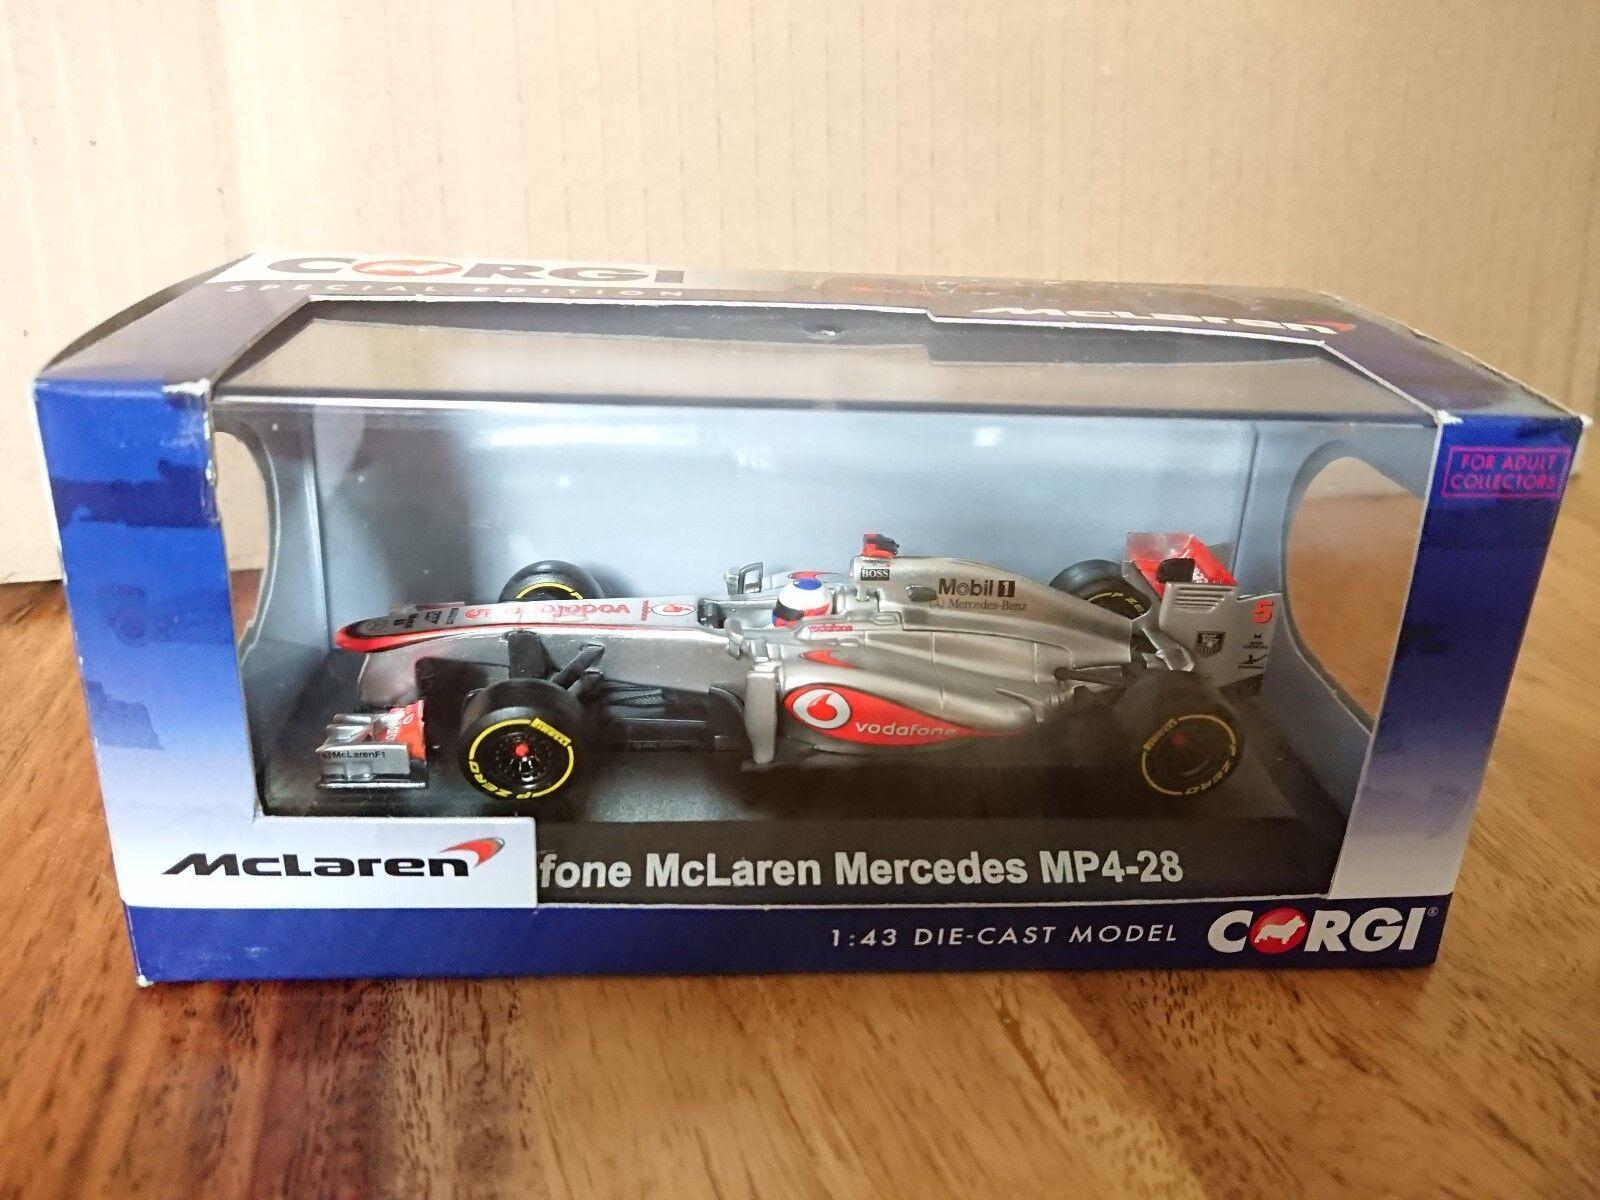 Corgi CC56701 Vodafone McLaren Mercedes MP4-28 2013 F1 Race Car Jenson Button